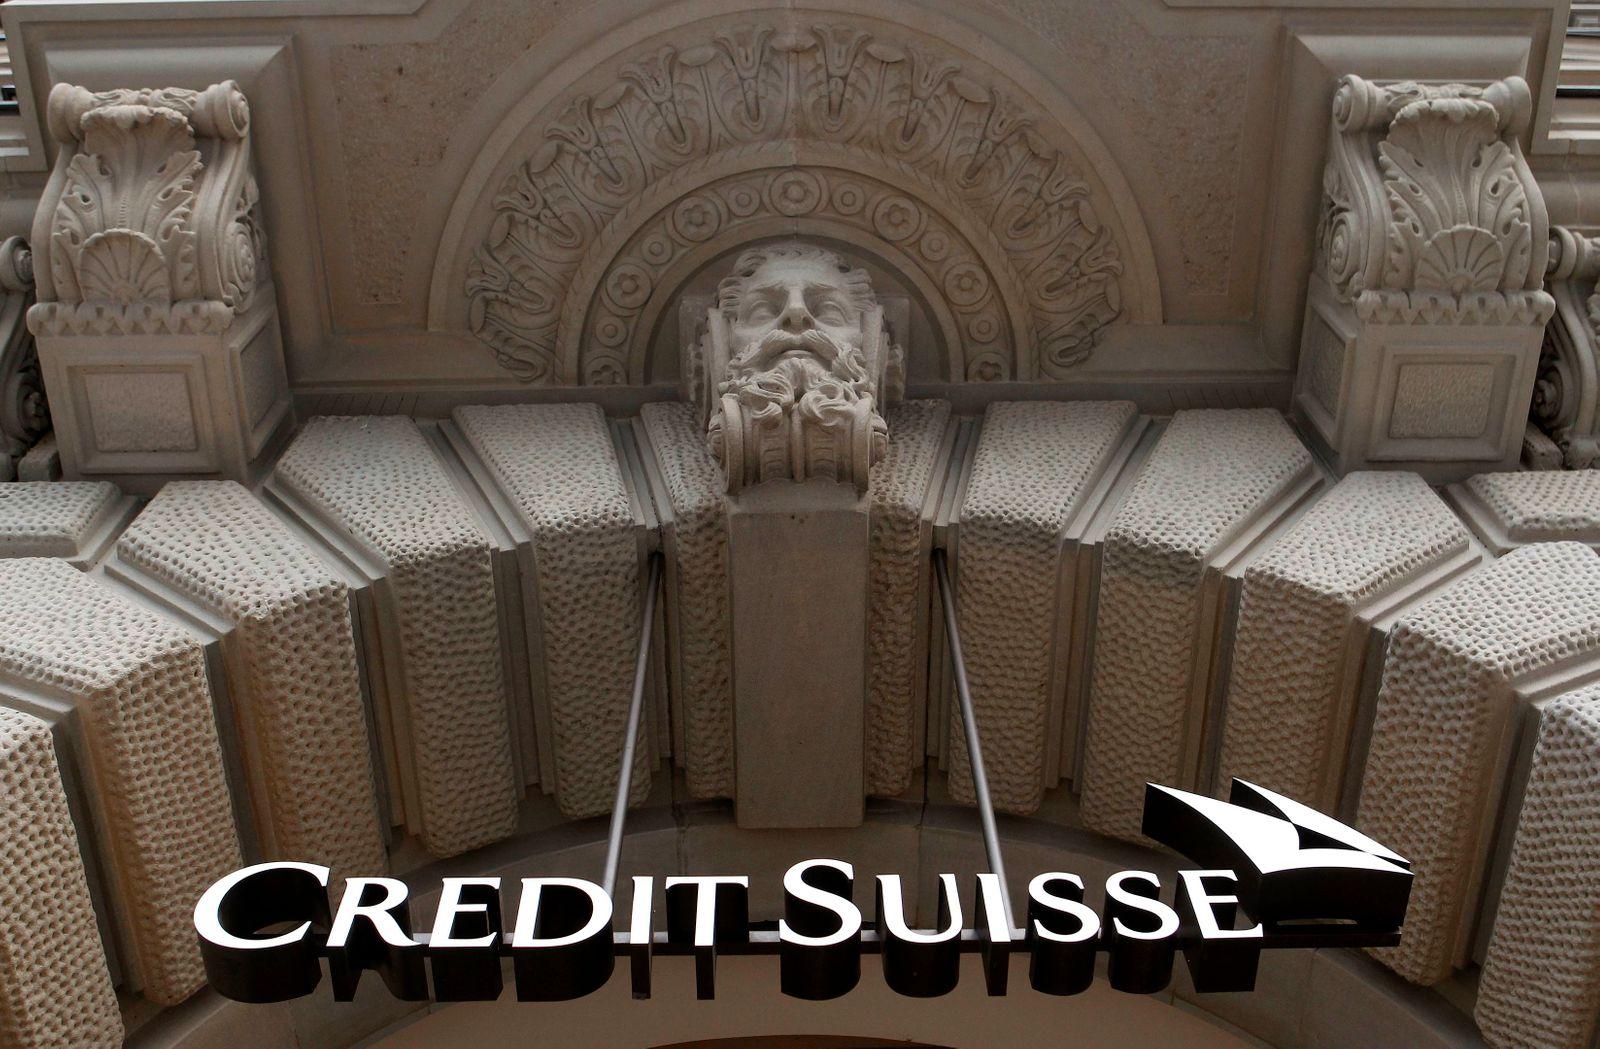 XXL Credit Suisse